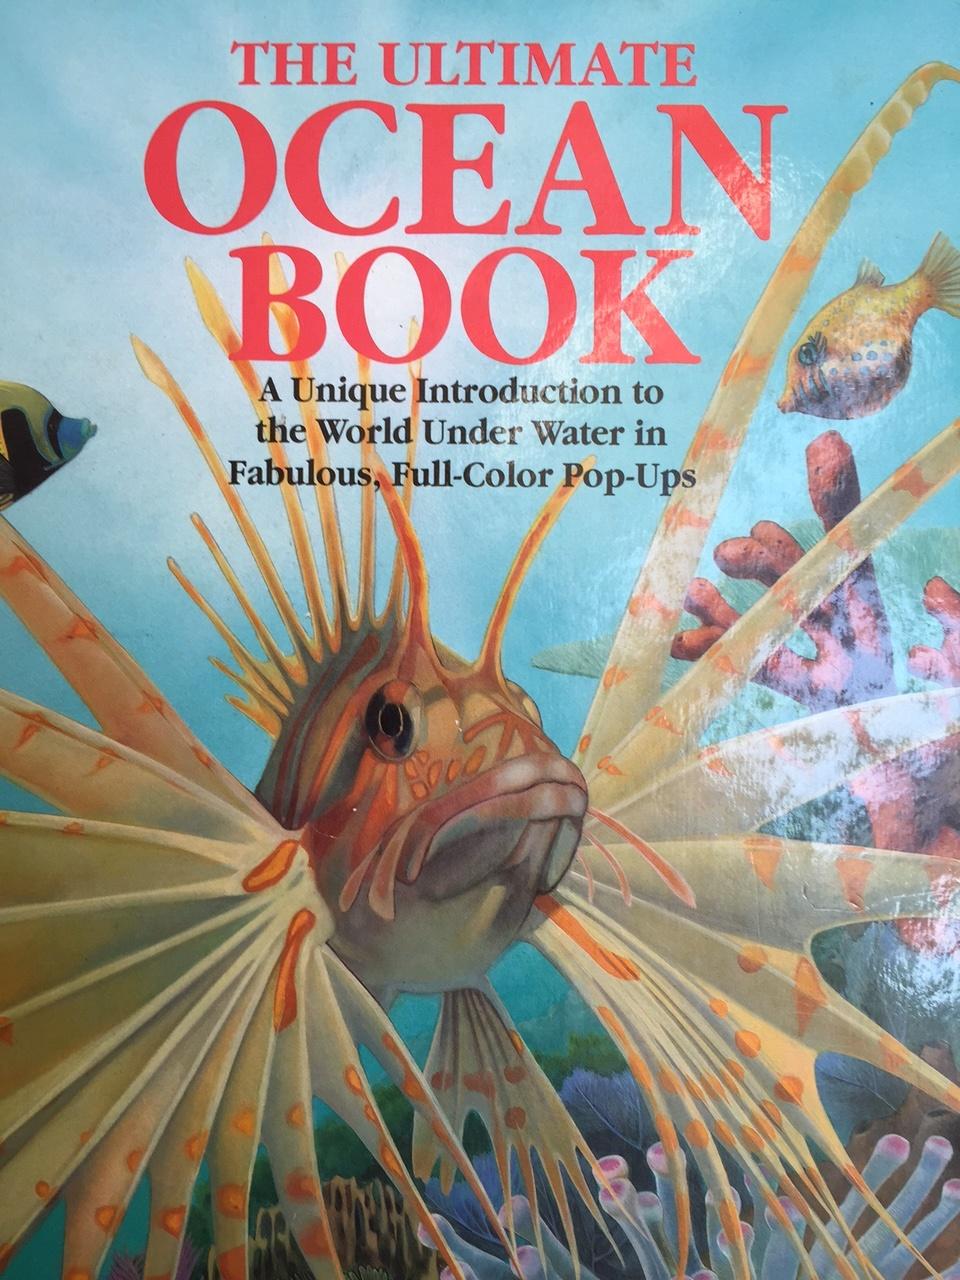 Ultimate Ocean Book cover.jpg